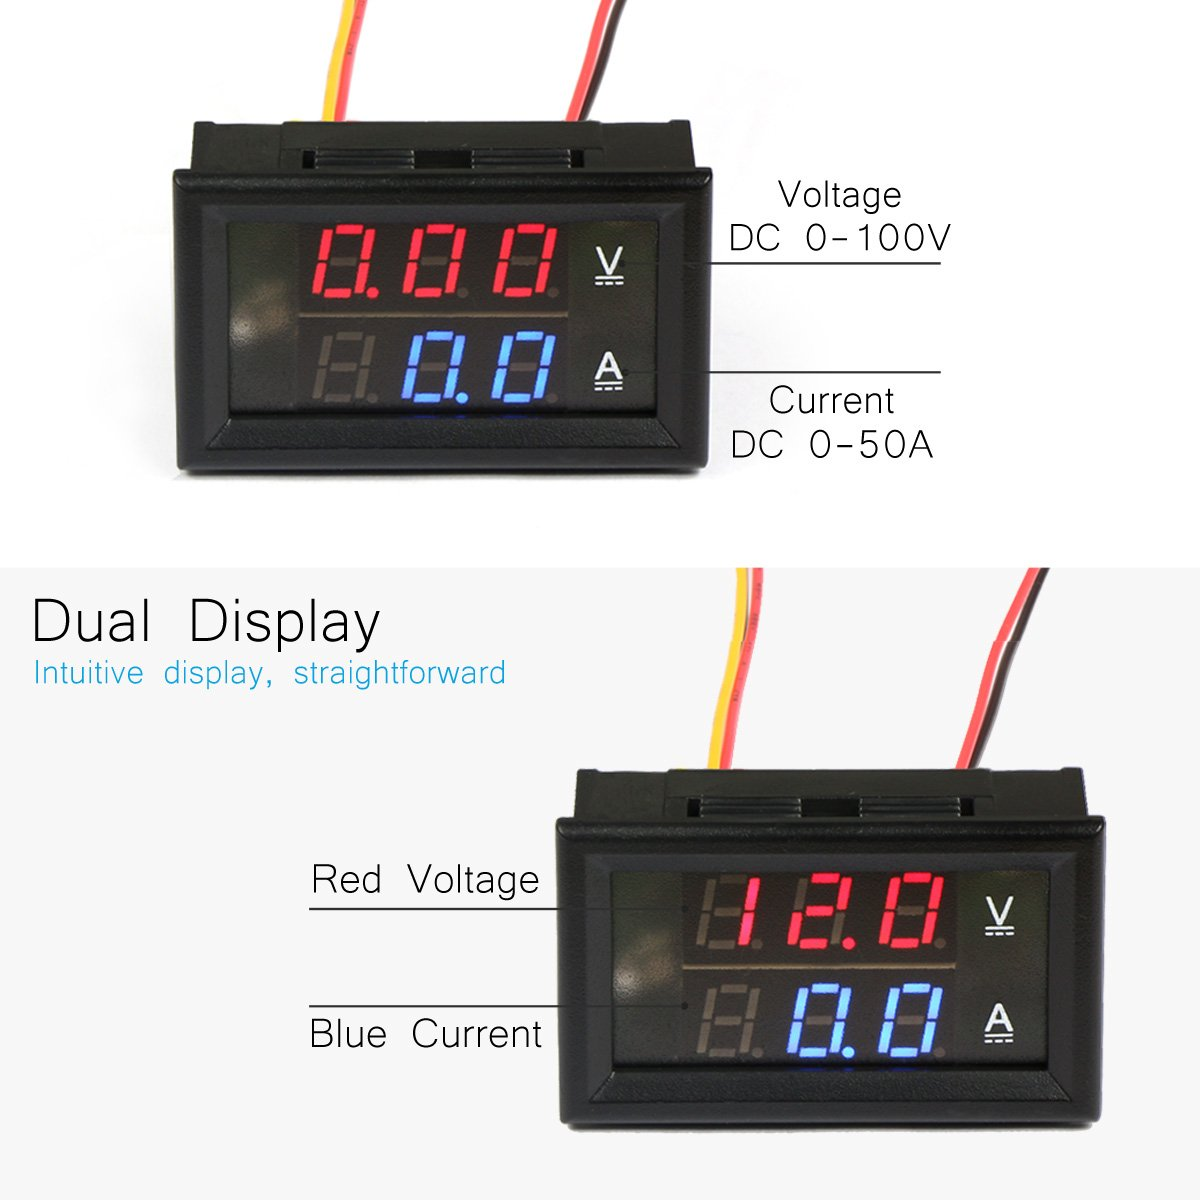 Drok Digital Led Current Voltage Measurement Dc 0 100v 50a Ampere Circuits The Bottom Blue Indicates Part Top Red Volt Meter Dual Color Testers Industrial Scientific